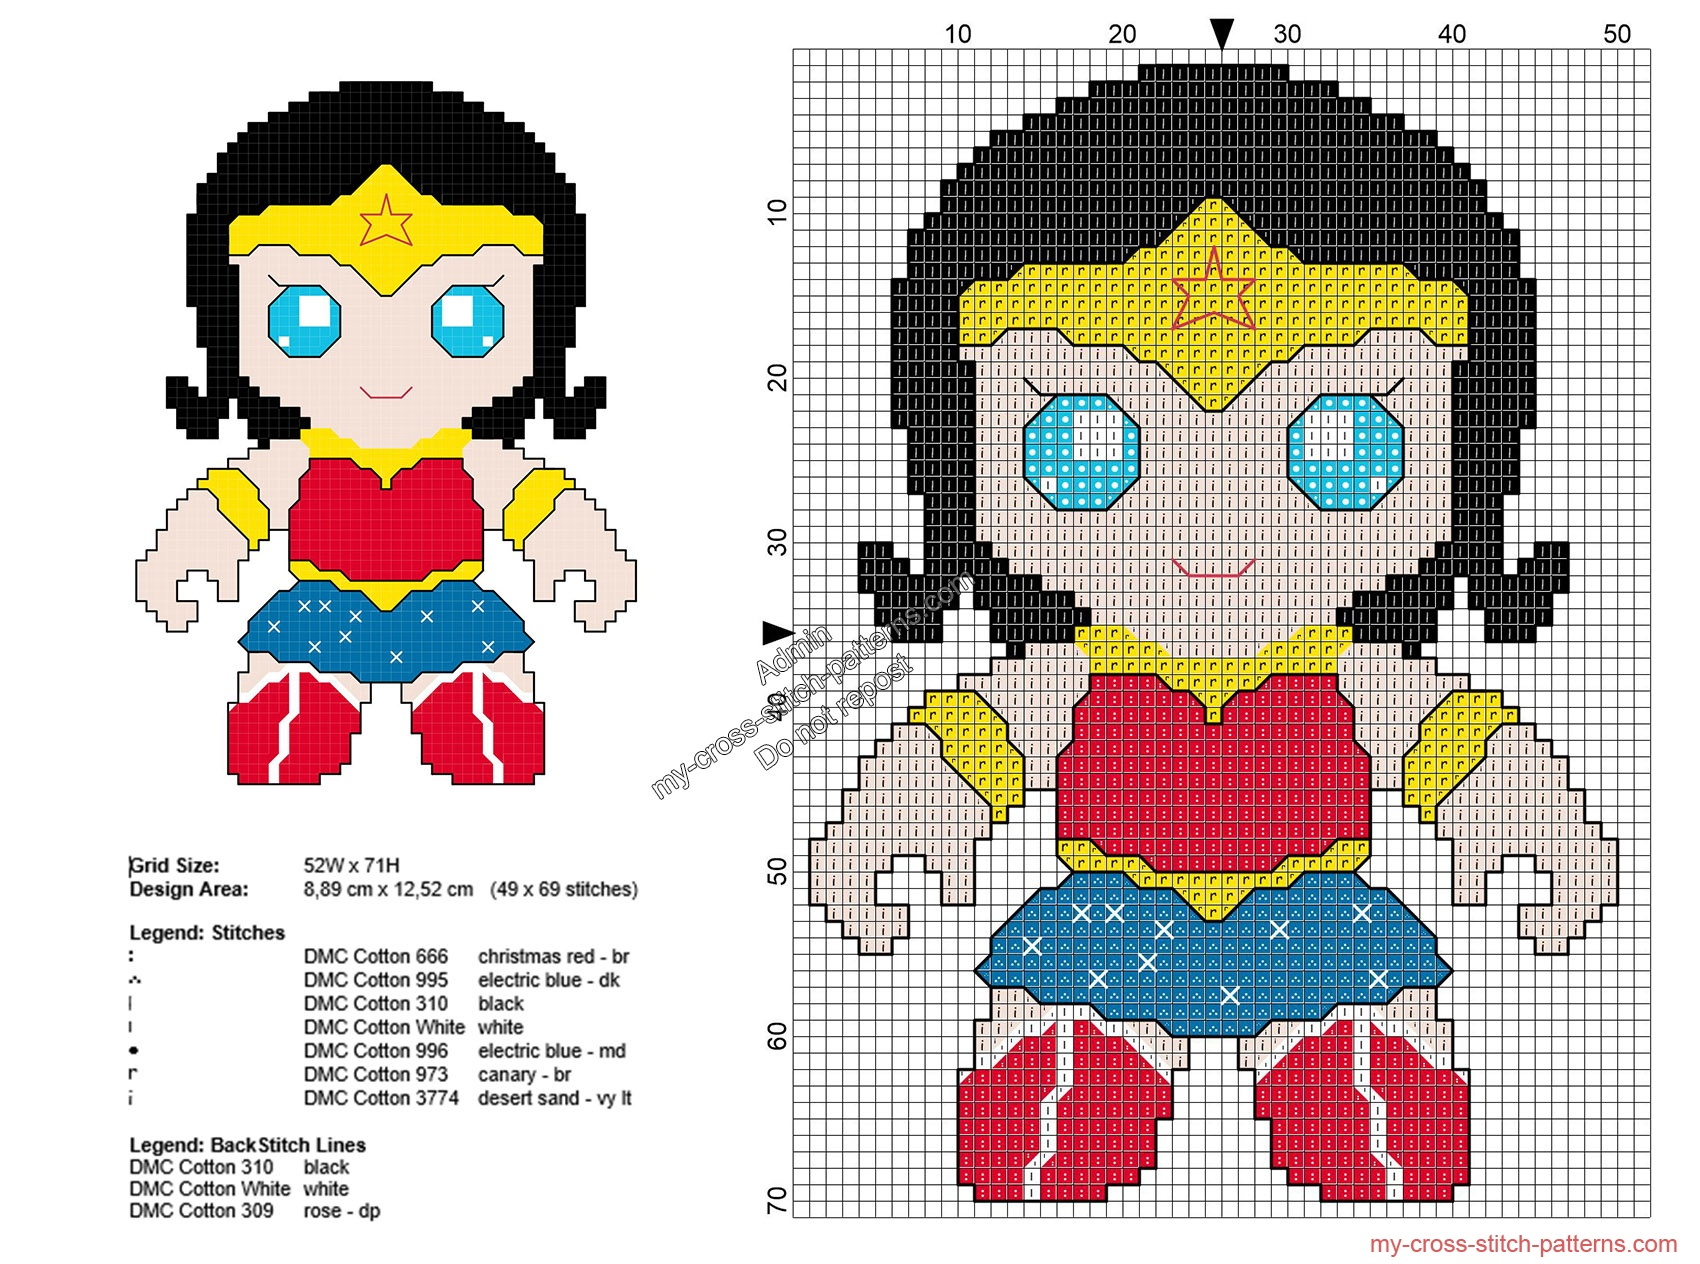 baby_wonder_woman_schemi_punto_croce_gratis_supereroi_49x69